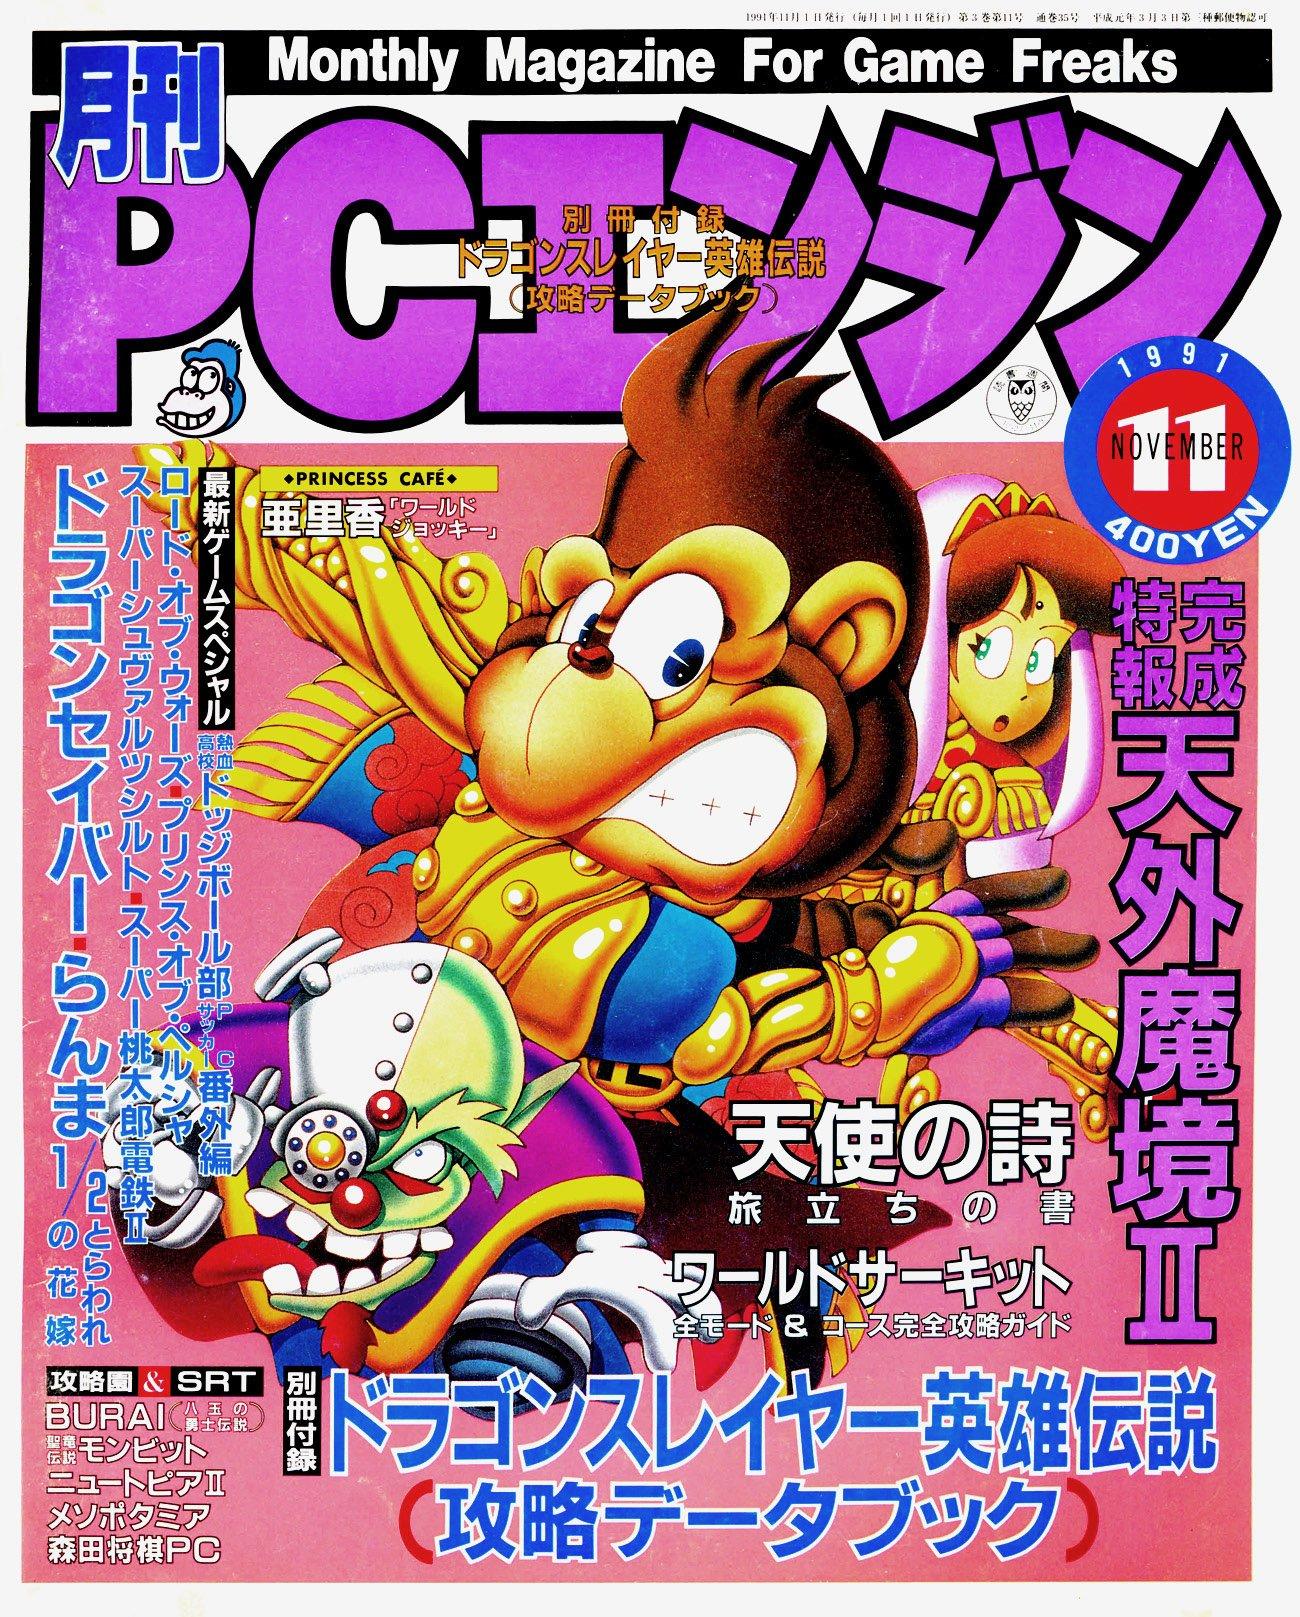 Gekkan PC Engine Issue 35 (November 1991)